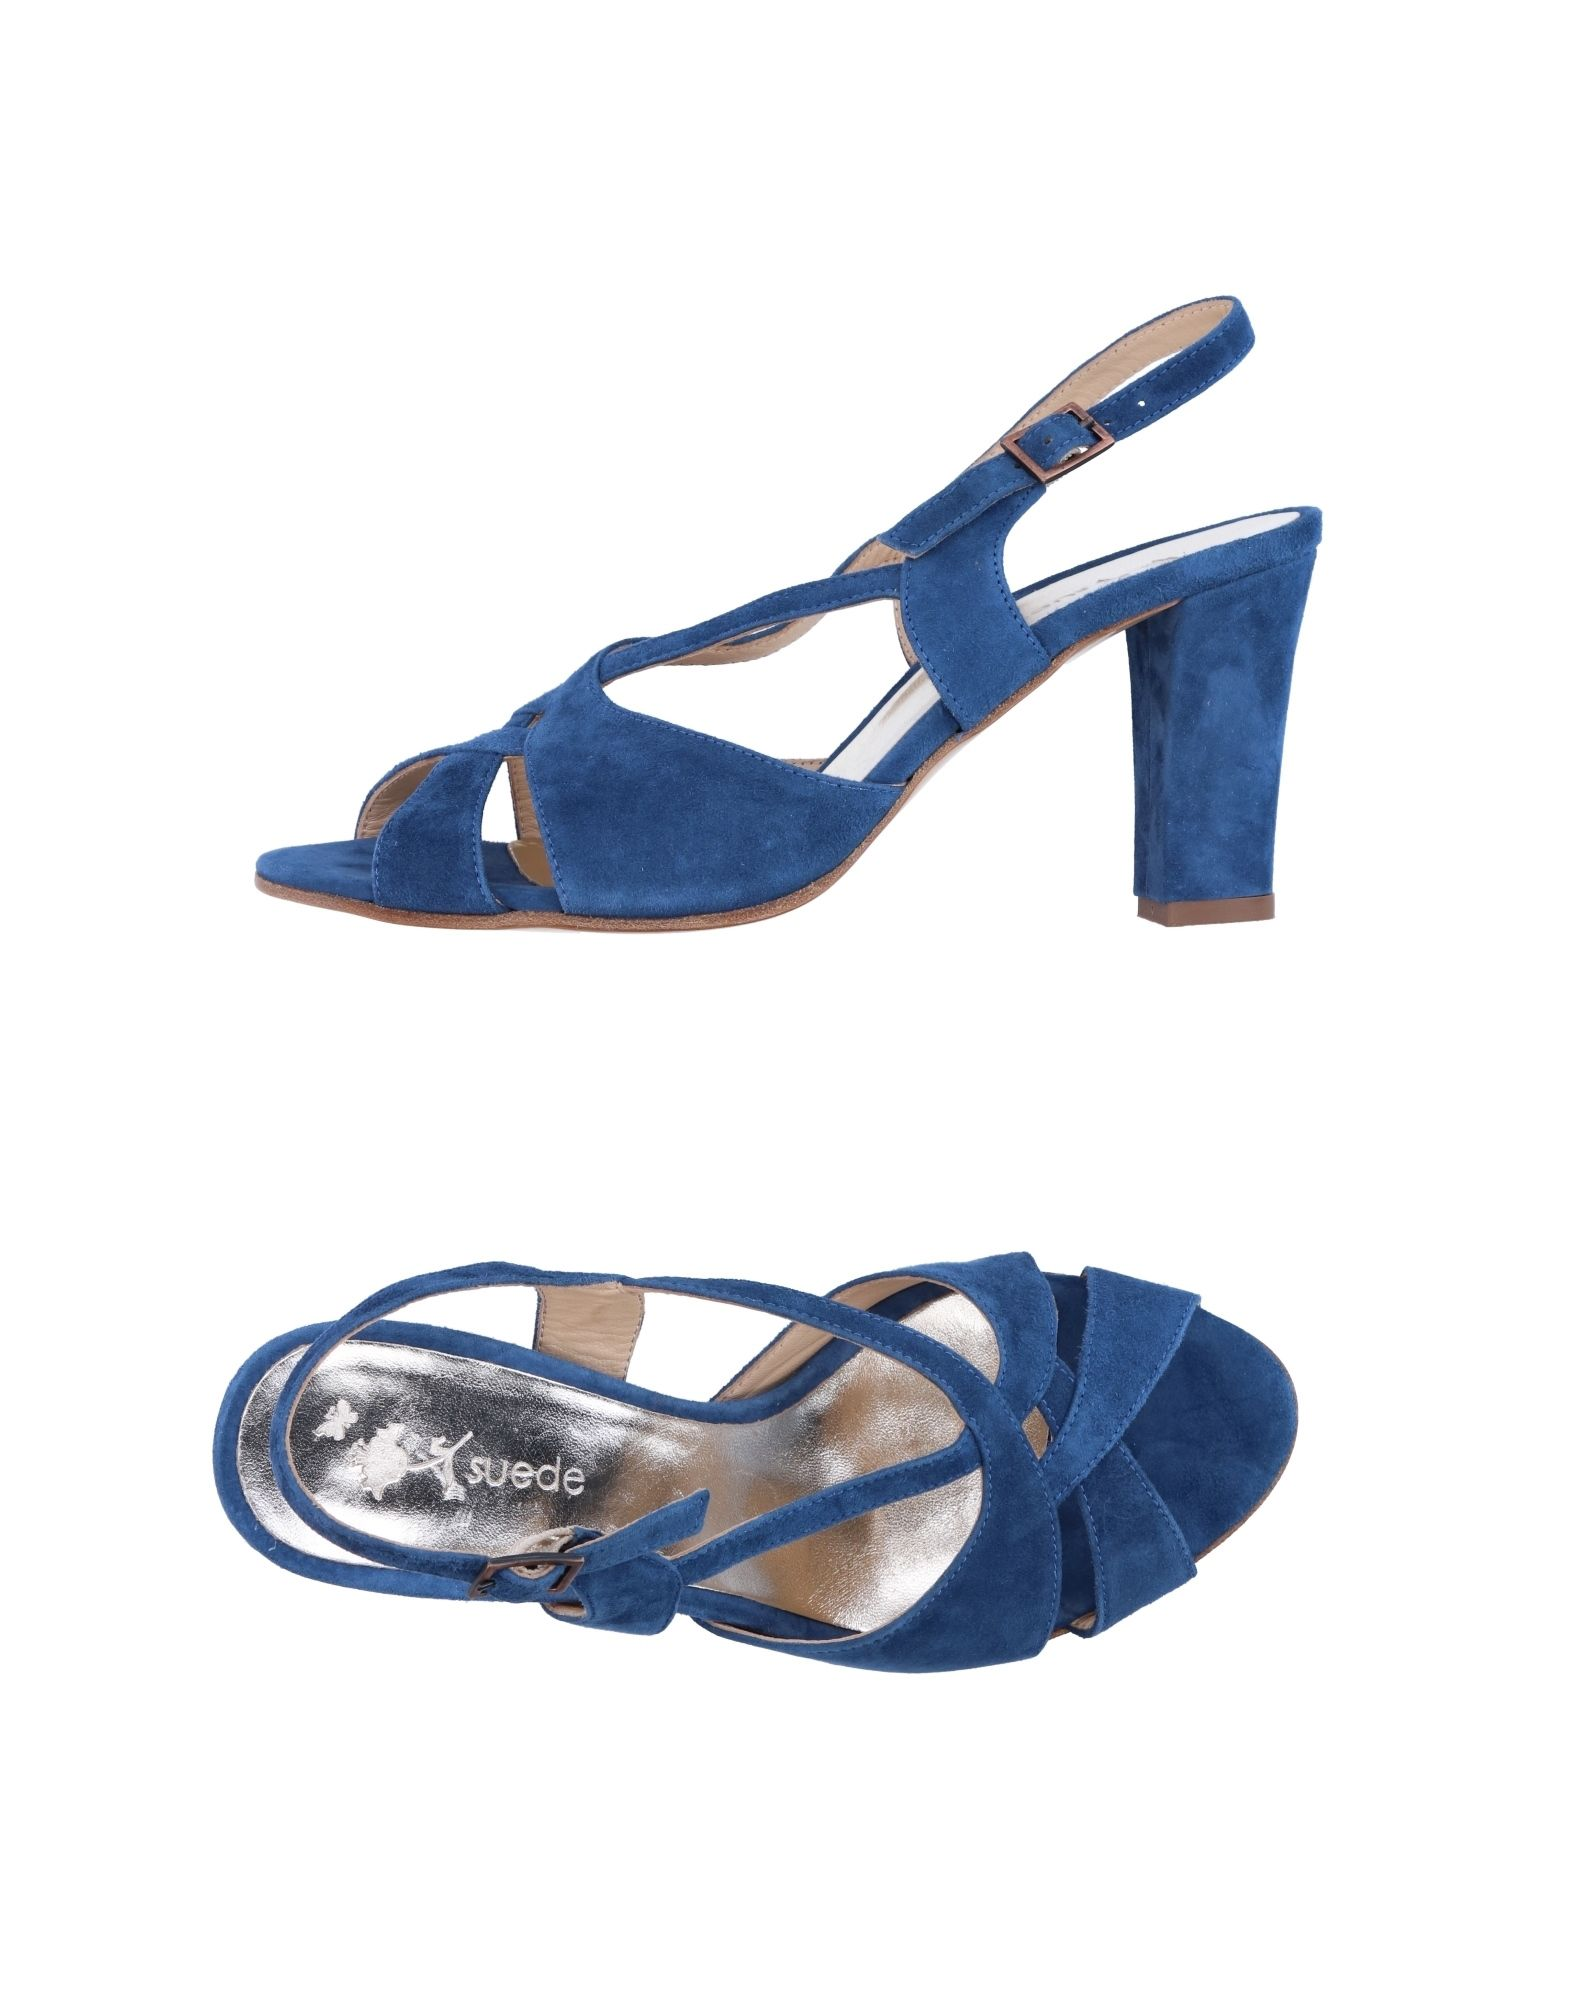 Sandales Suede Femme - Sandales Suede sur